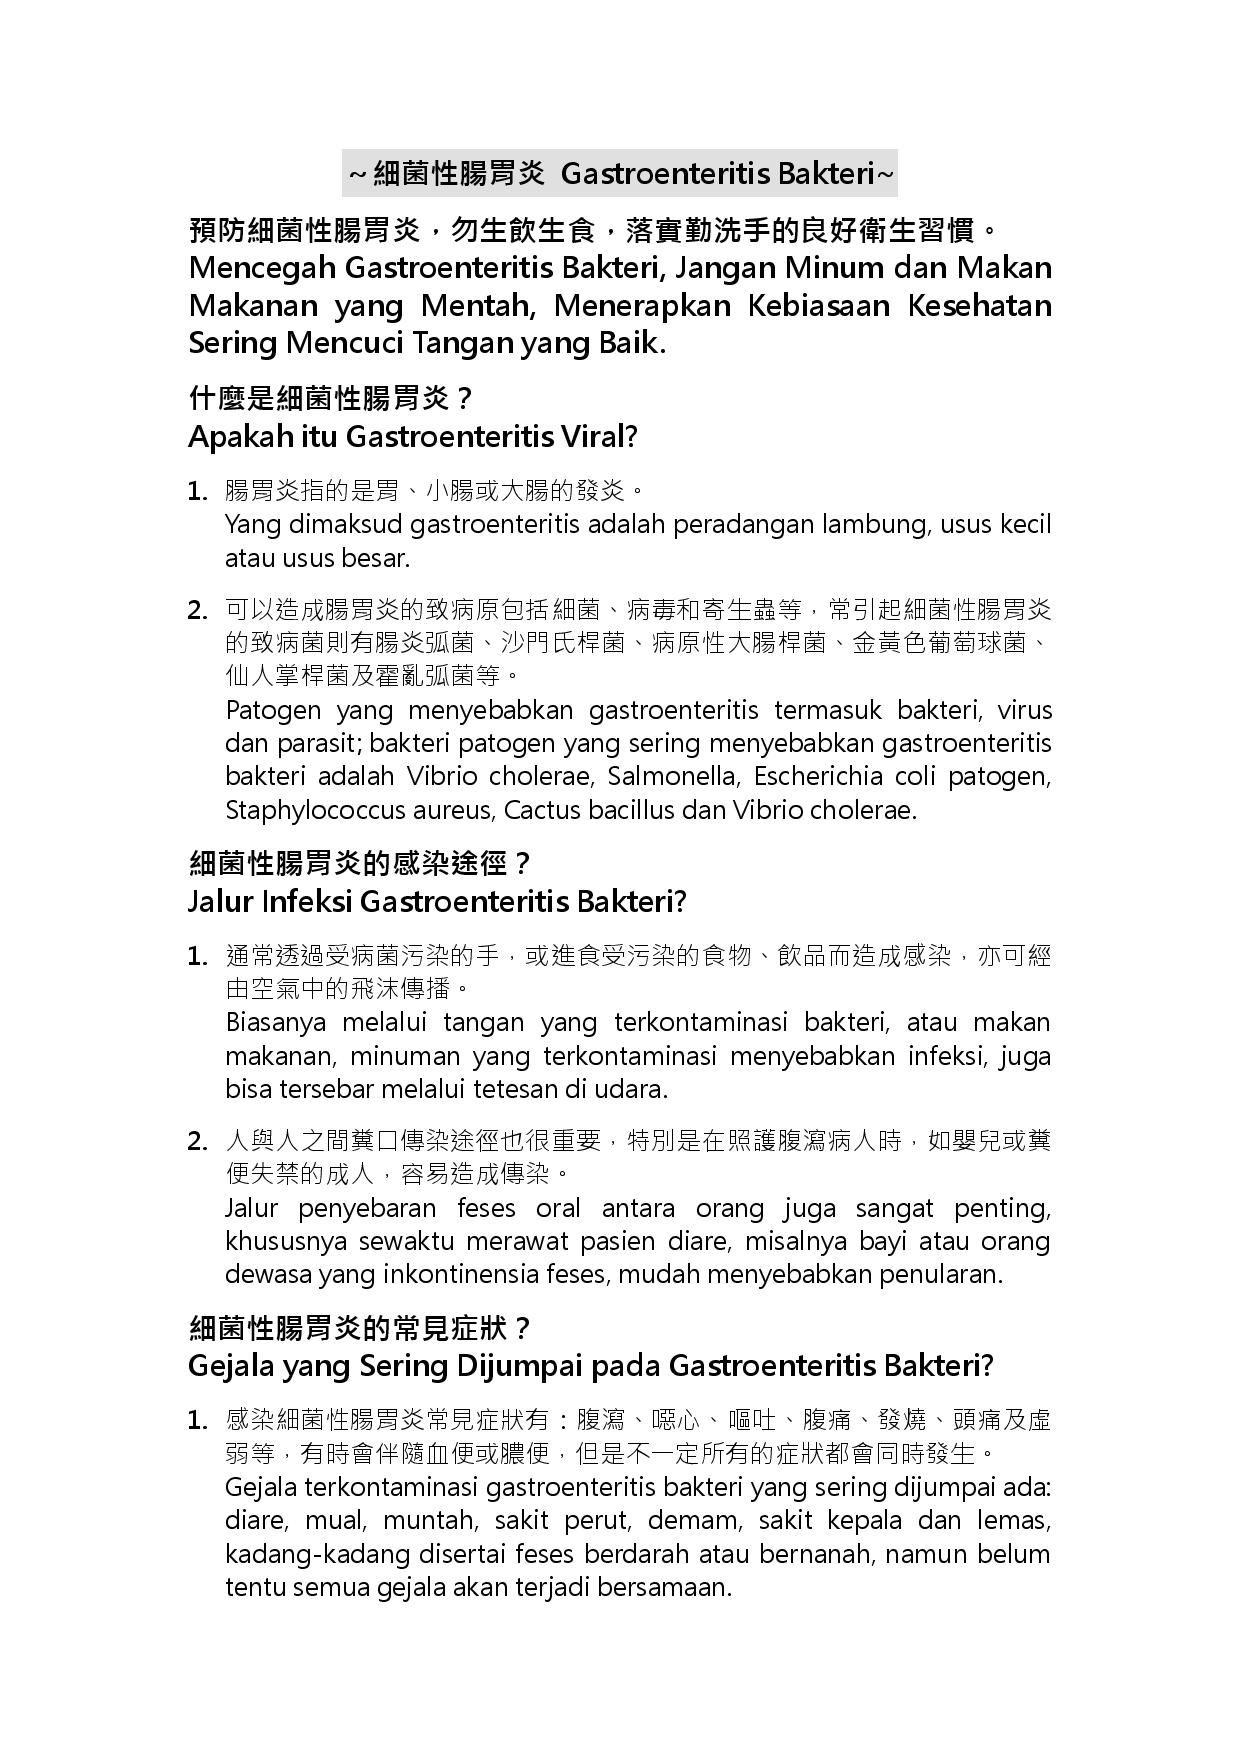 詳如附件【Klik】Mencegah Gastroenteritis Bakteri(Halaman 1)預防細菌性腸胃炎(印尼文)